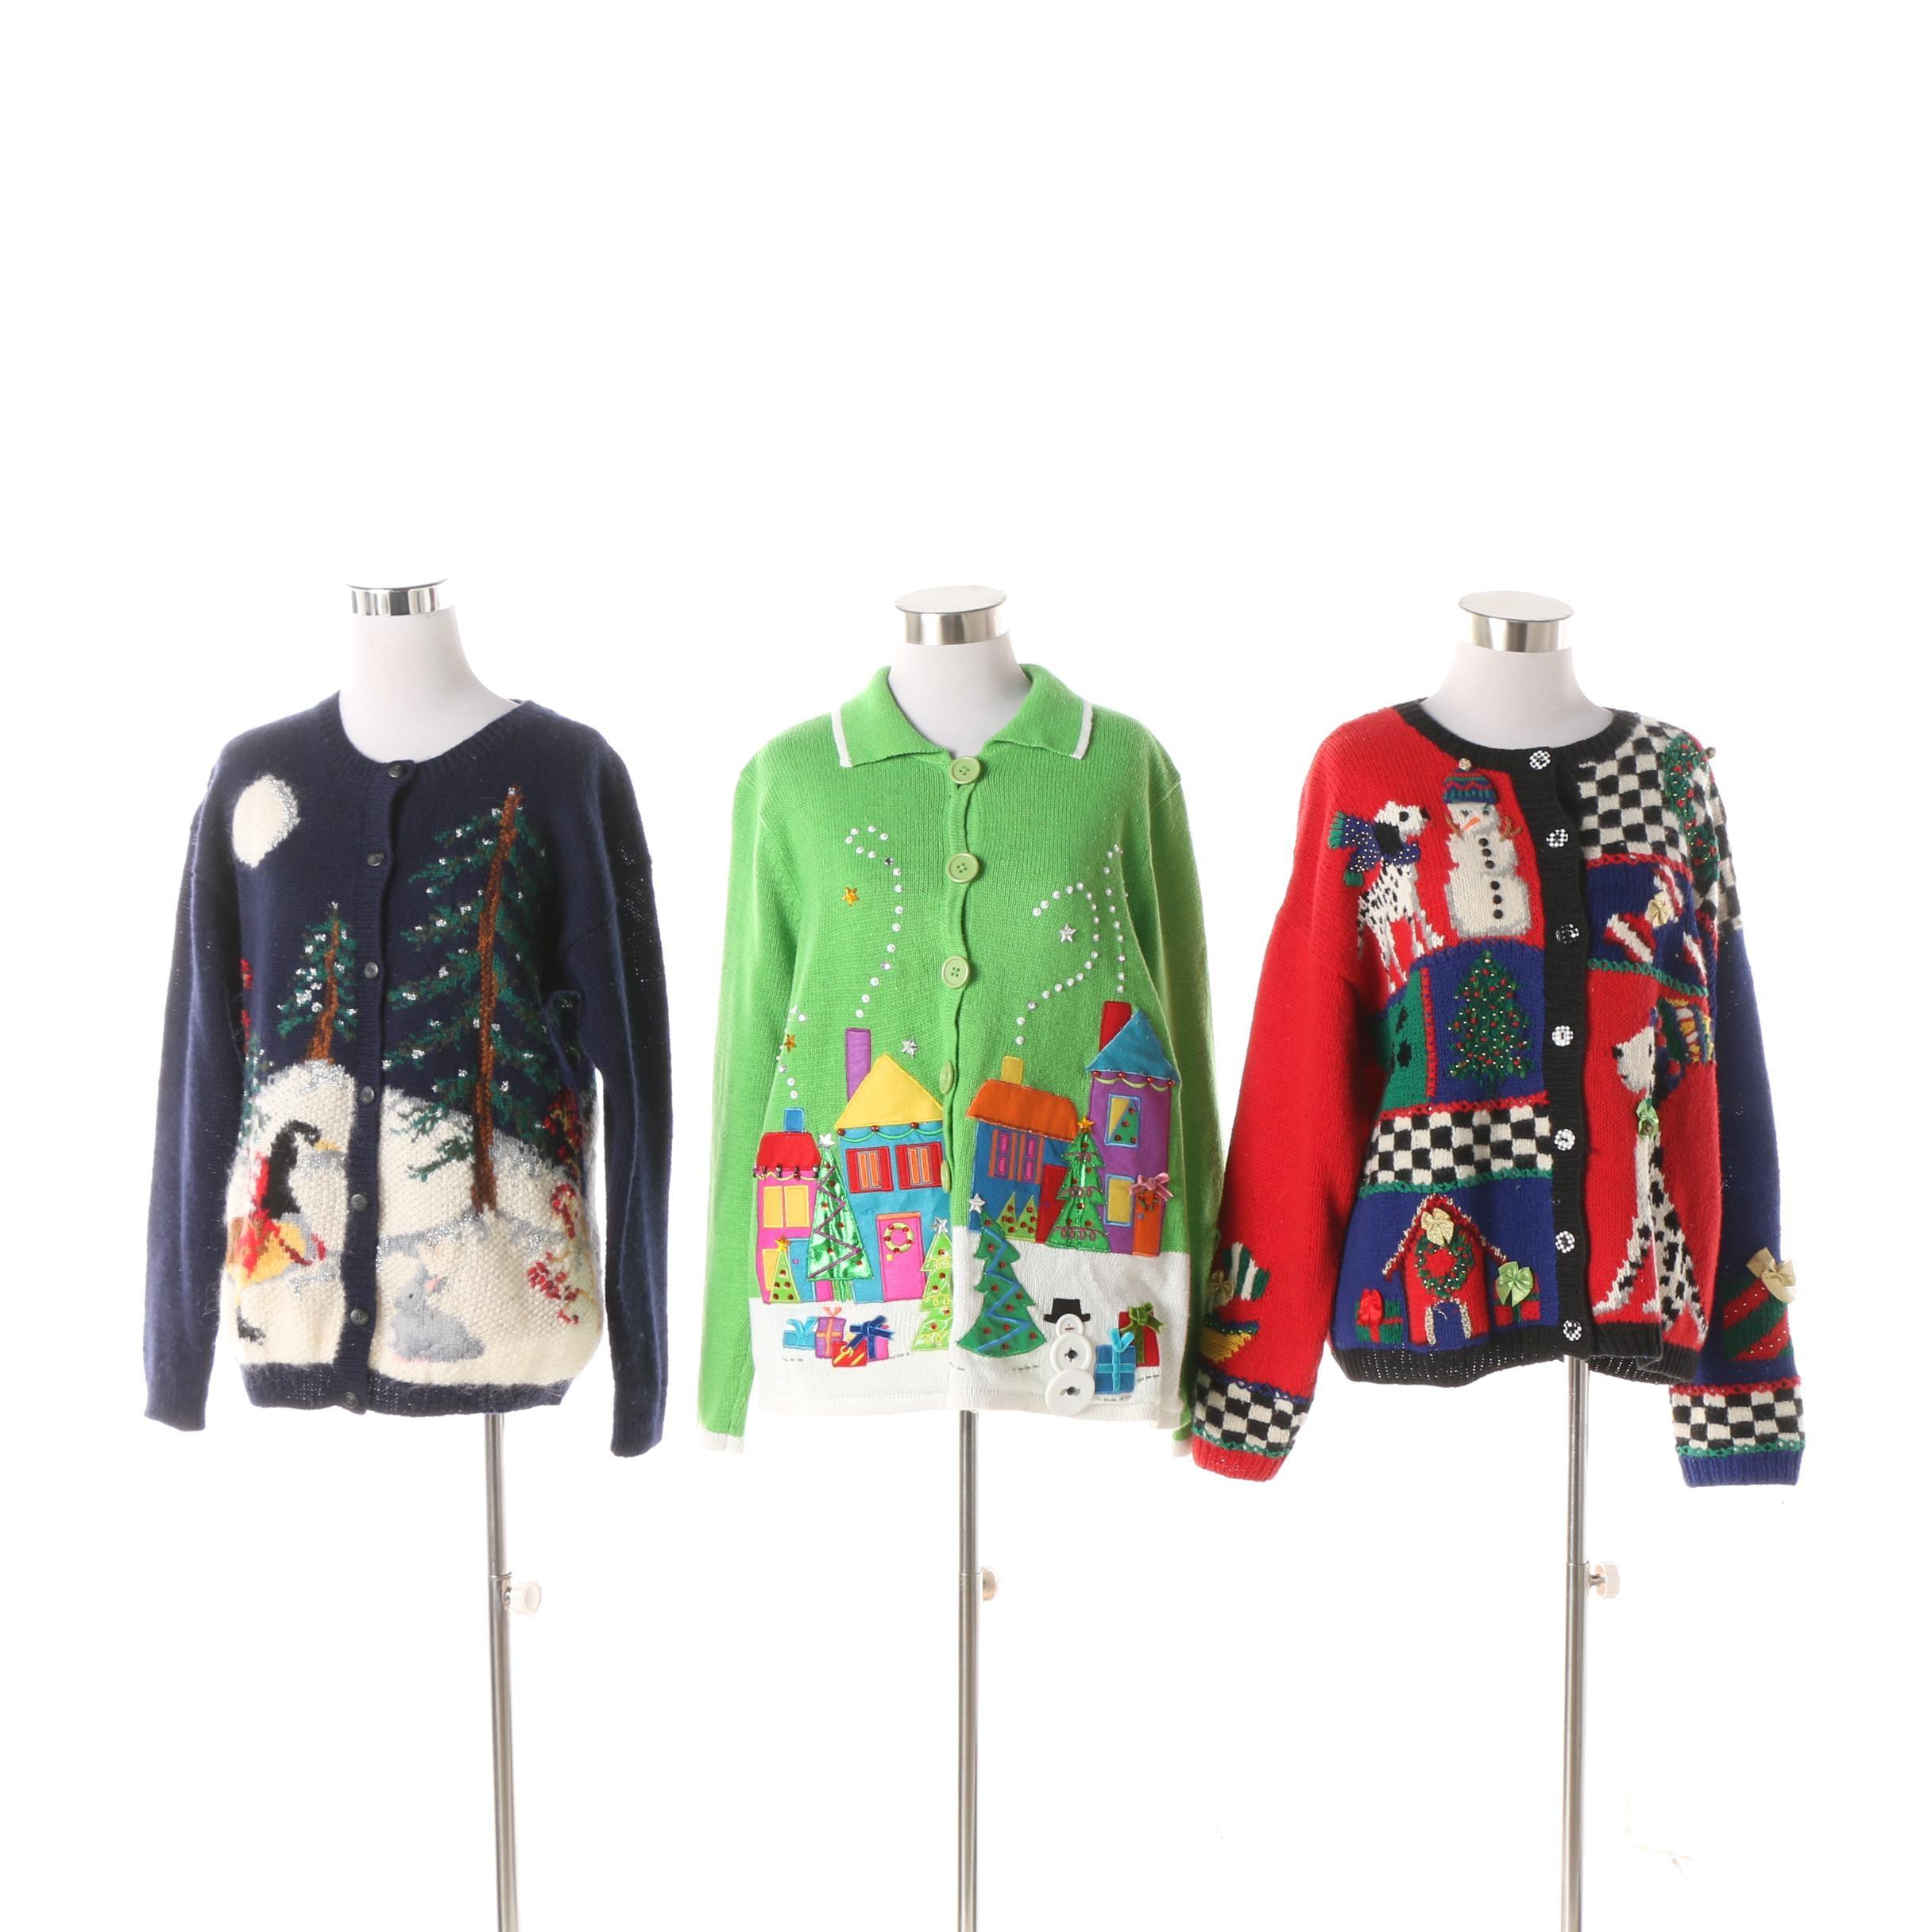 Women's Vintage Christmas Motif Knit Cardigans including Marisa Christina